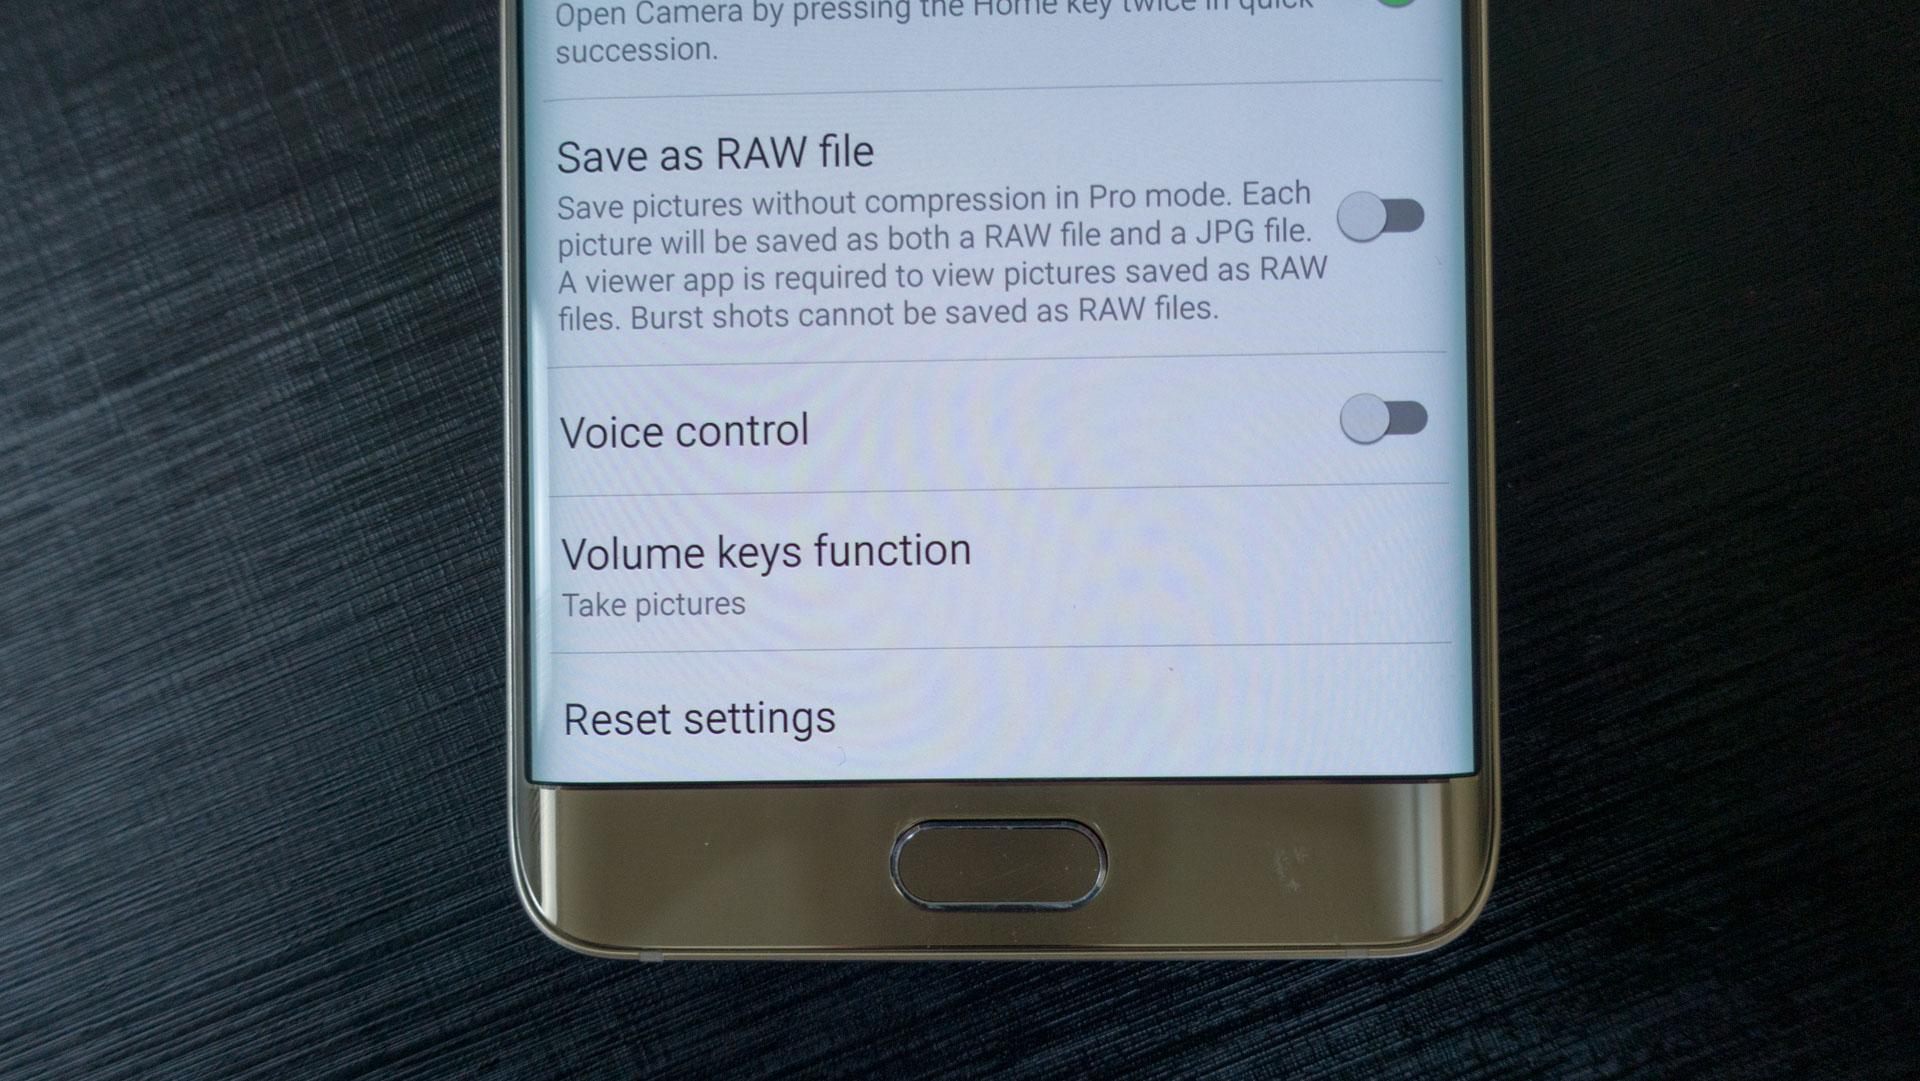 Samsung-Galaxy-S6-Edge-plus-Camera-Tips-Tricks-AH-2